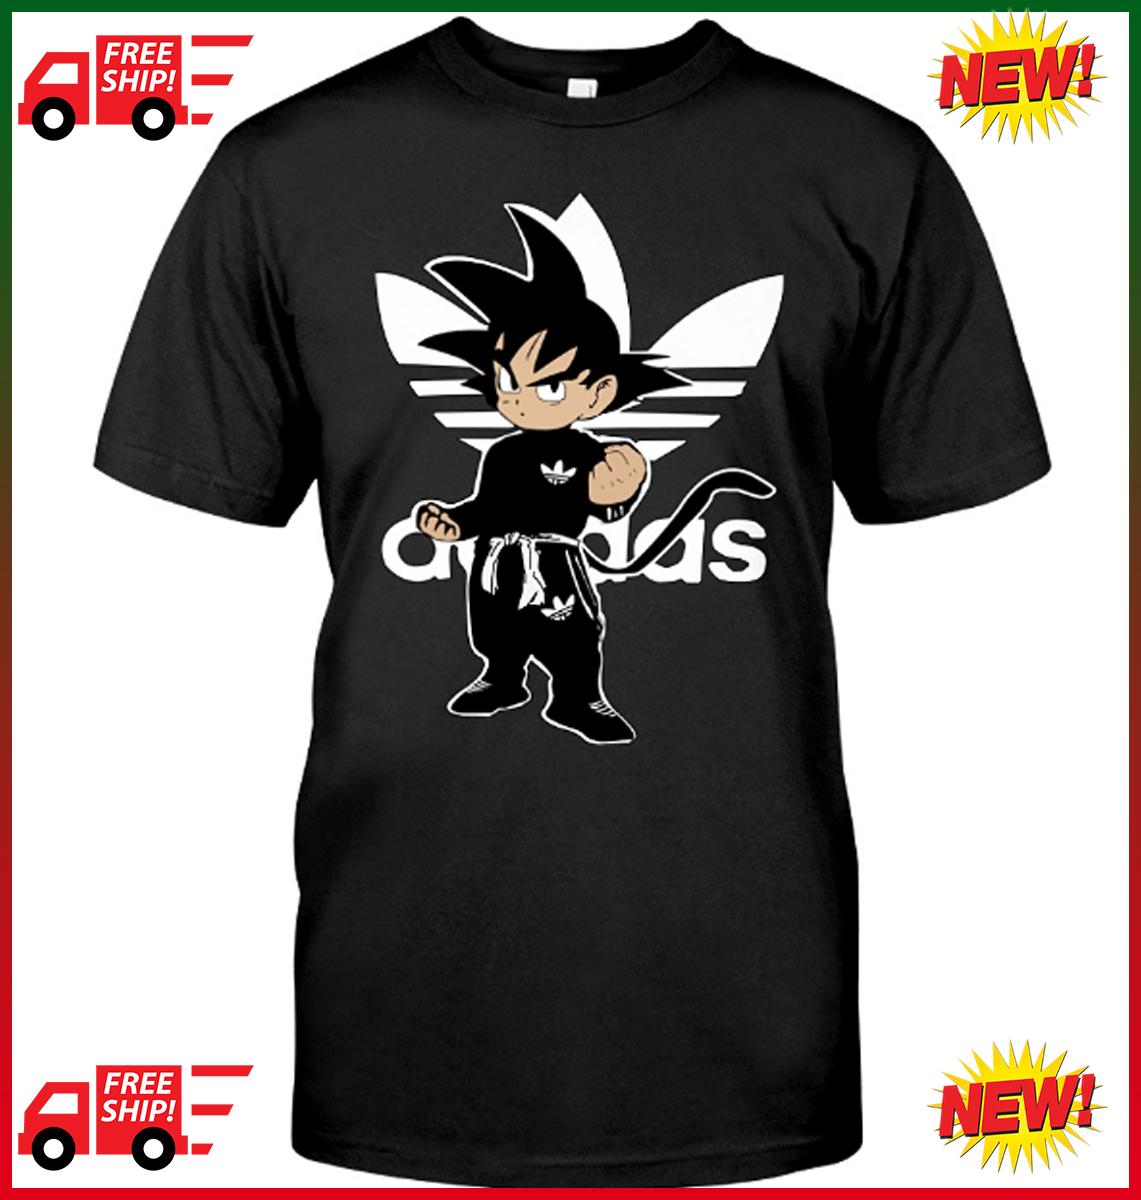 camiseta dragon ball adidas